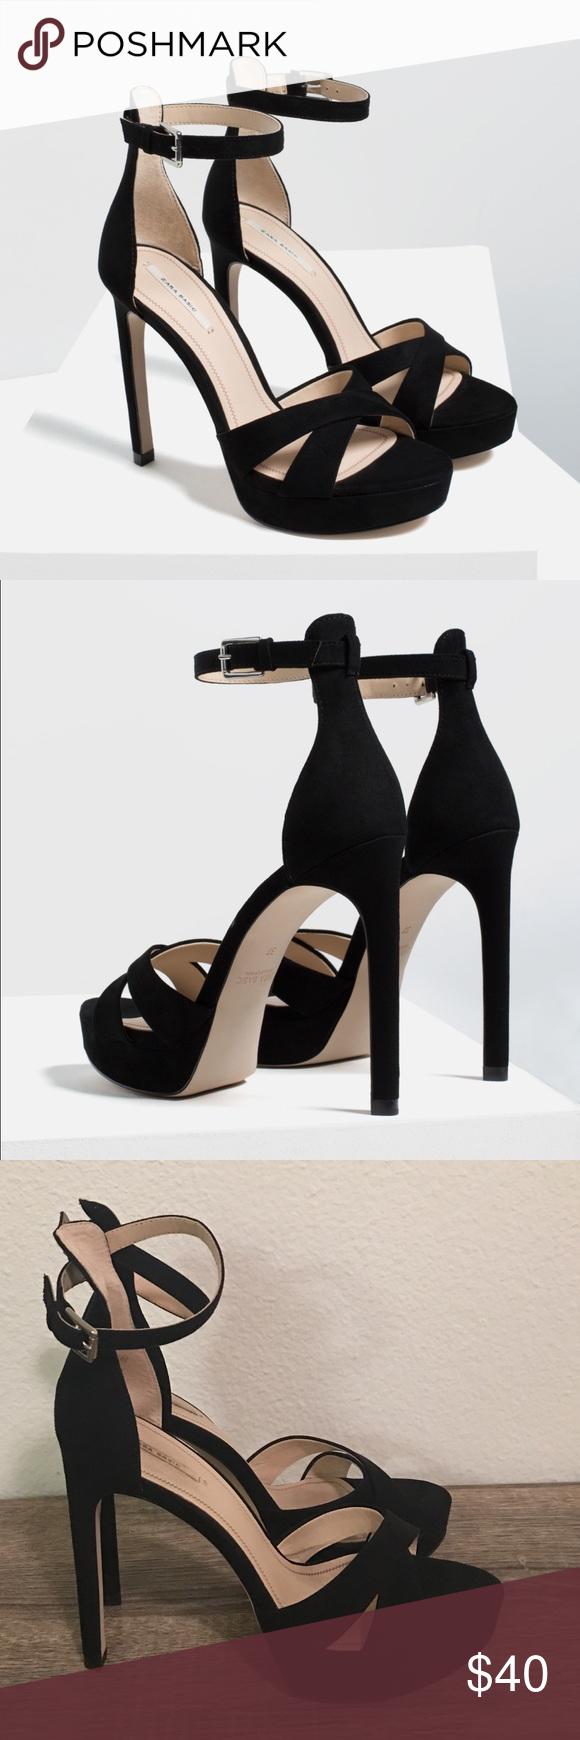 ee42f0da2513 High heels platform sandals Zara black high heels size 9.5